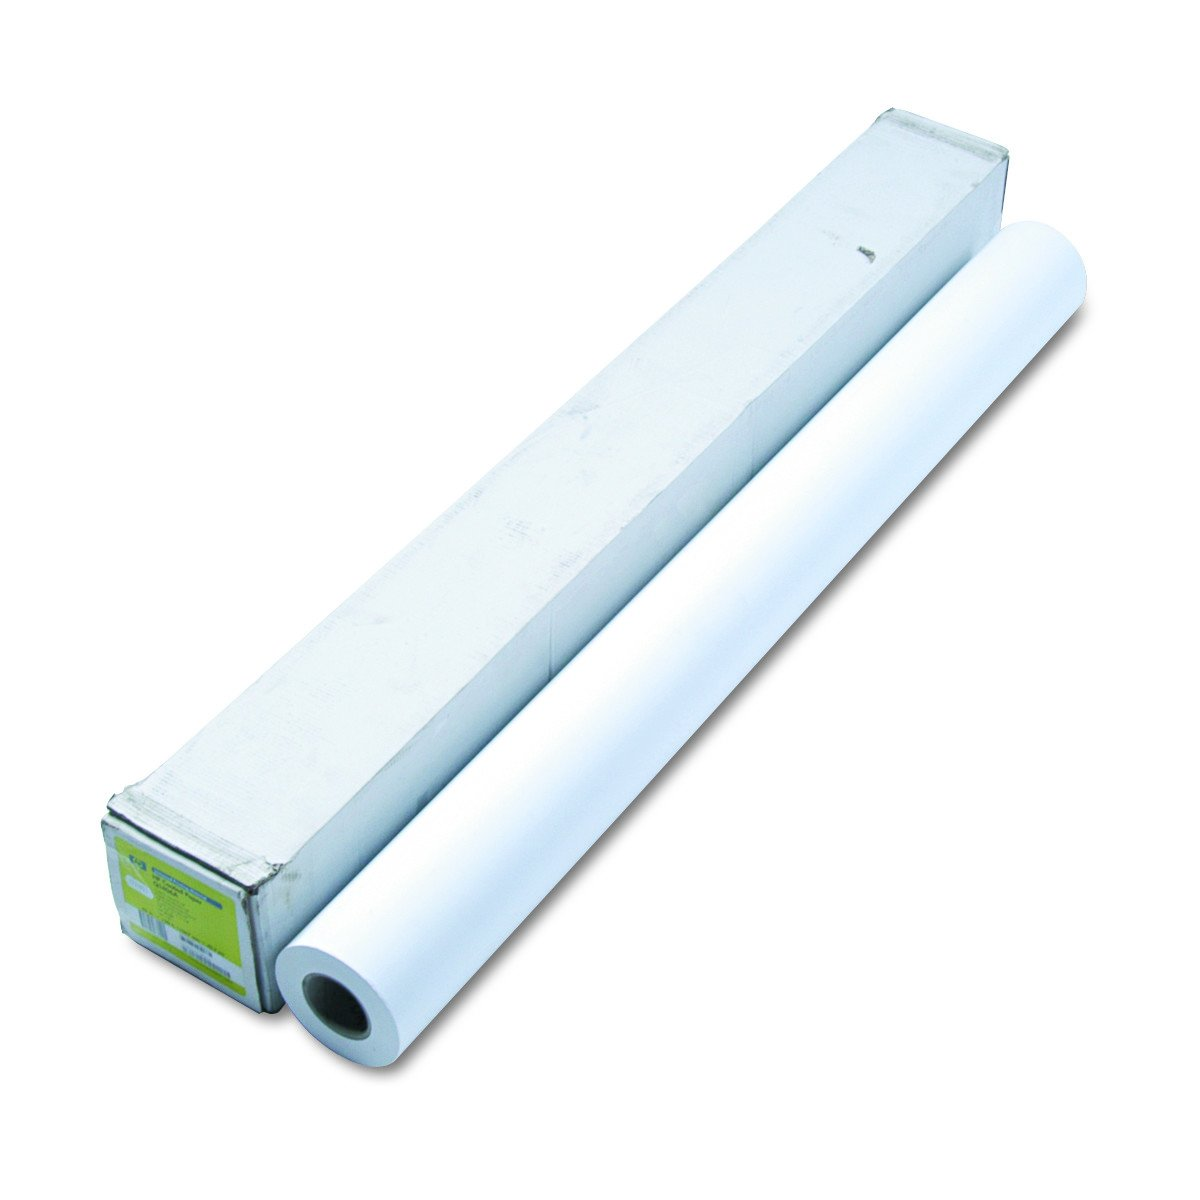 HP Q1406B Designjet Inkjet Large Format Paper, 4.9 mil, 42'' x 150 ft, White